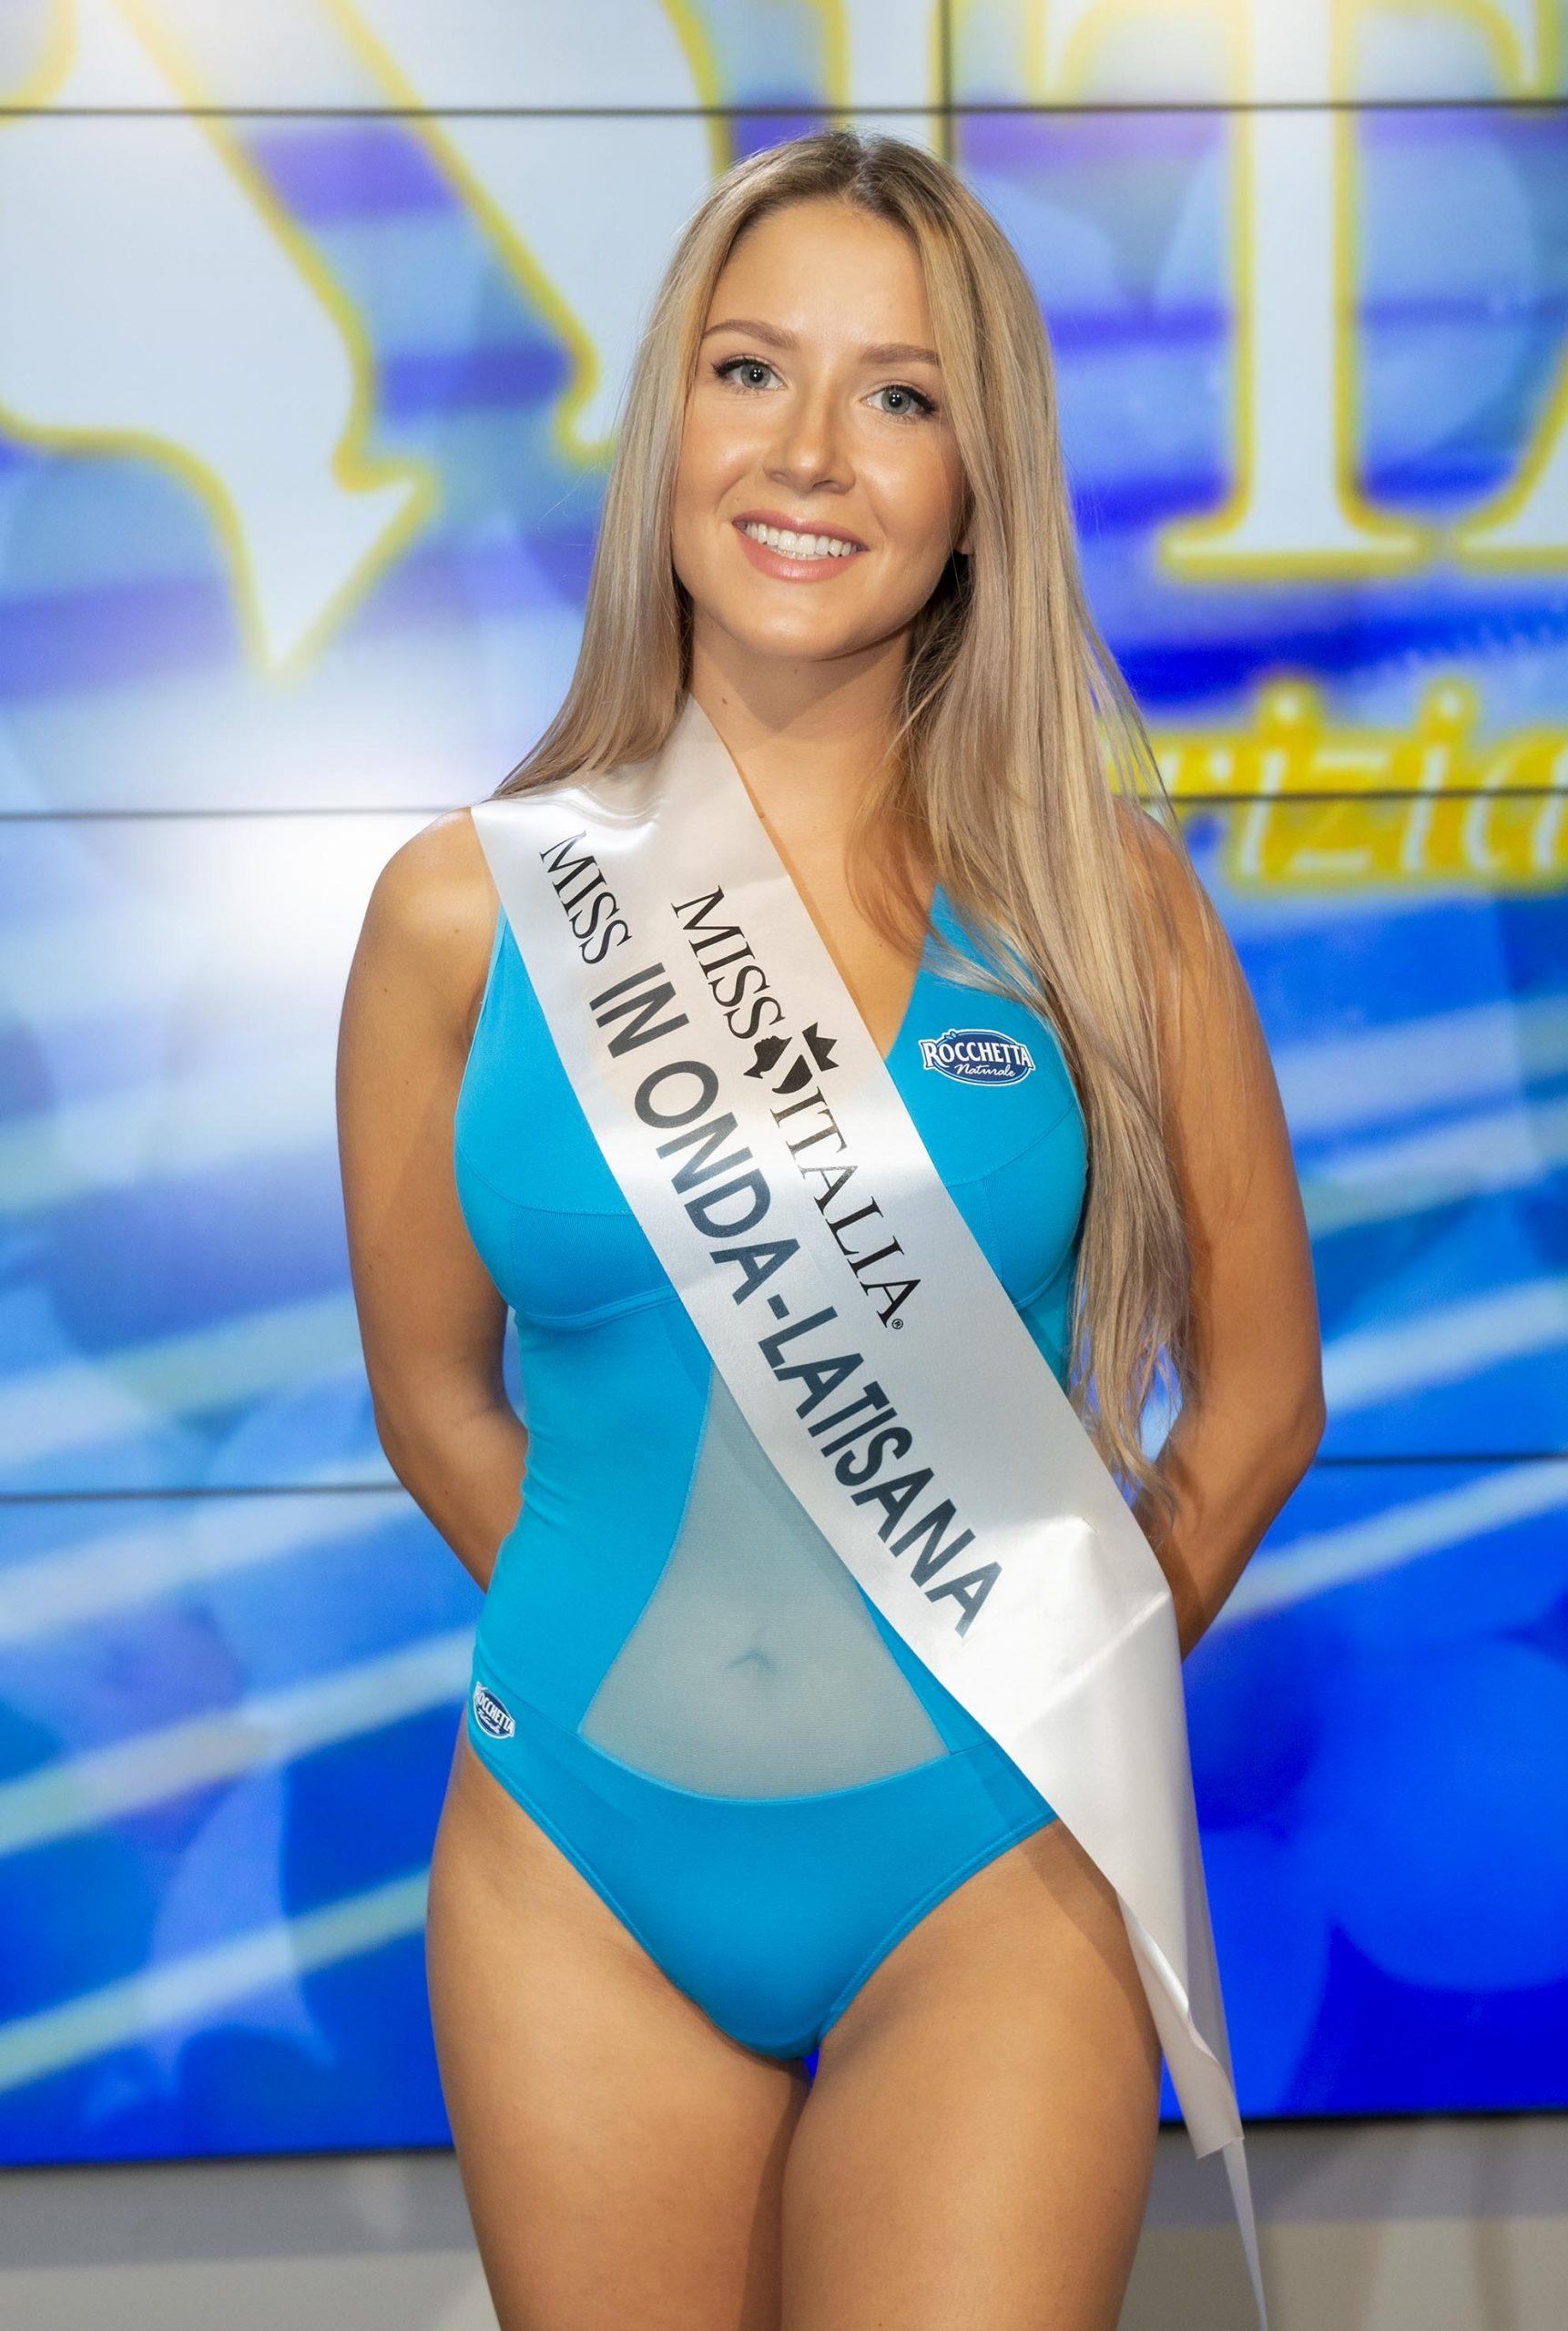 Valentina Petris - Miss in Onda Latisana